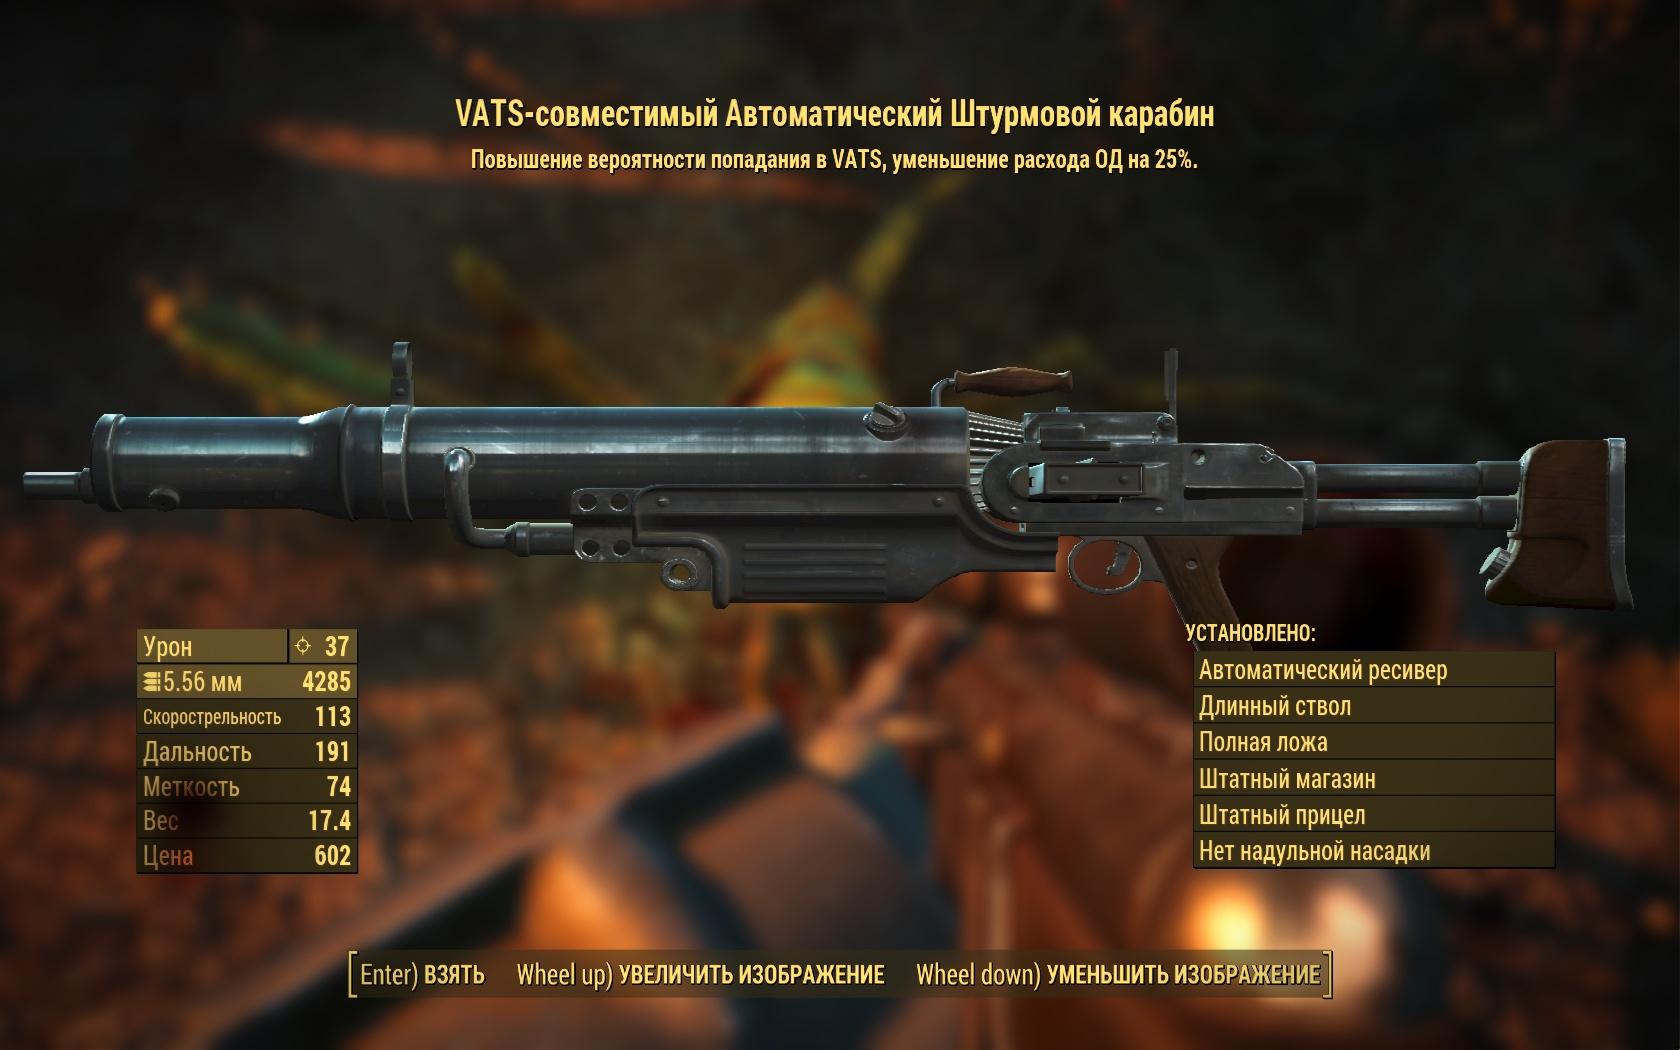 карабин - Fallout 4 VATS, VATS-совместимый, автоматический, Оружие, совместимый, штурмовой